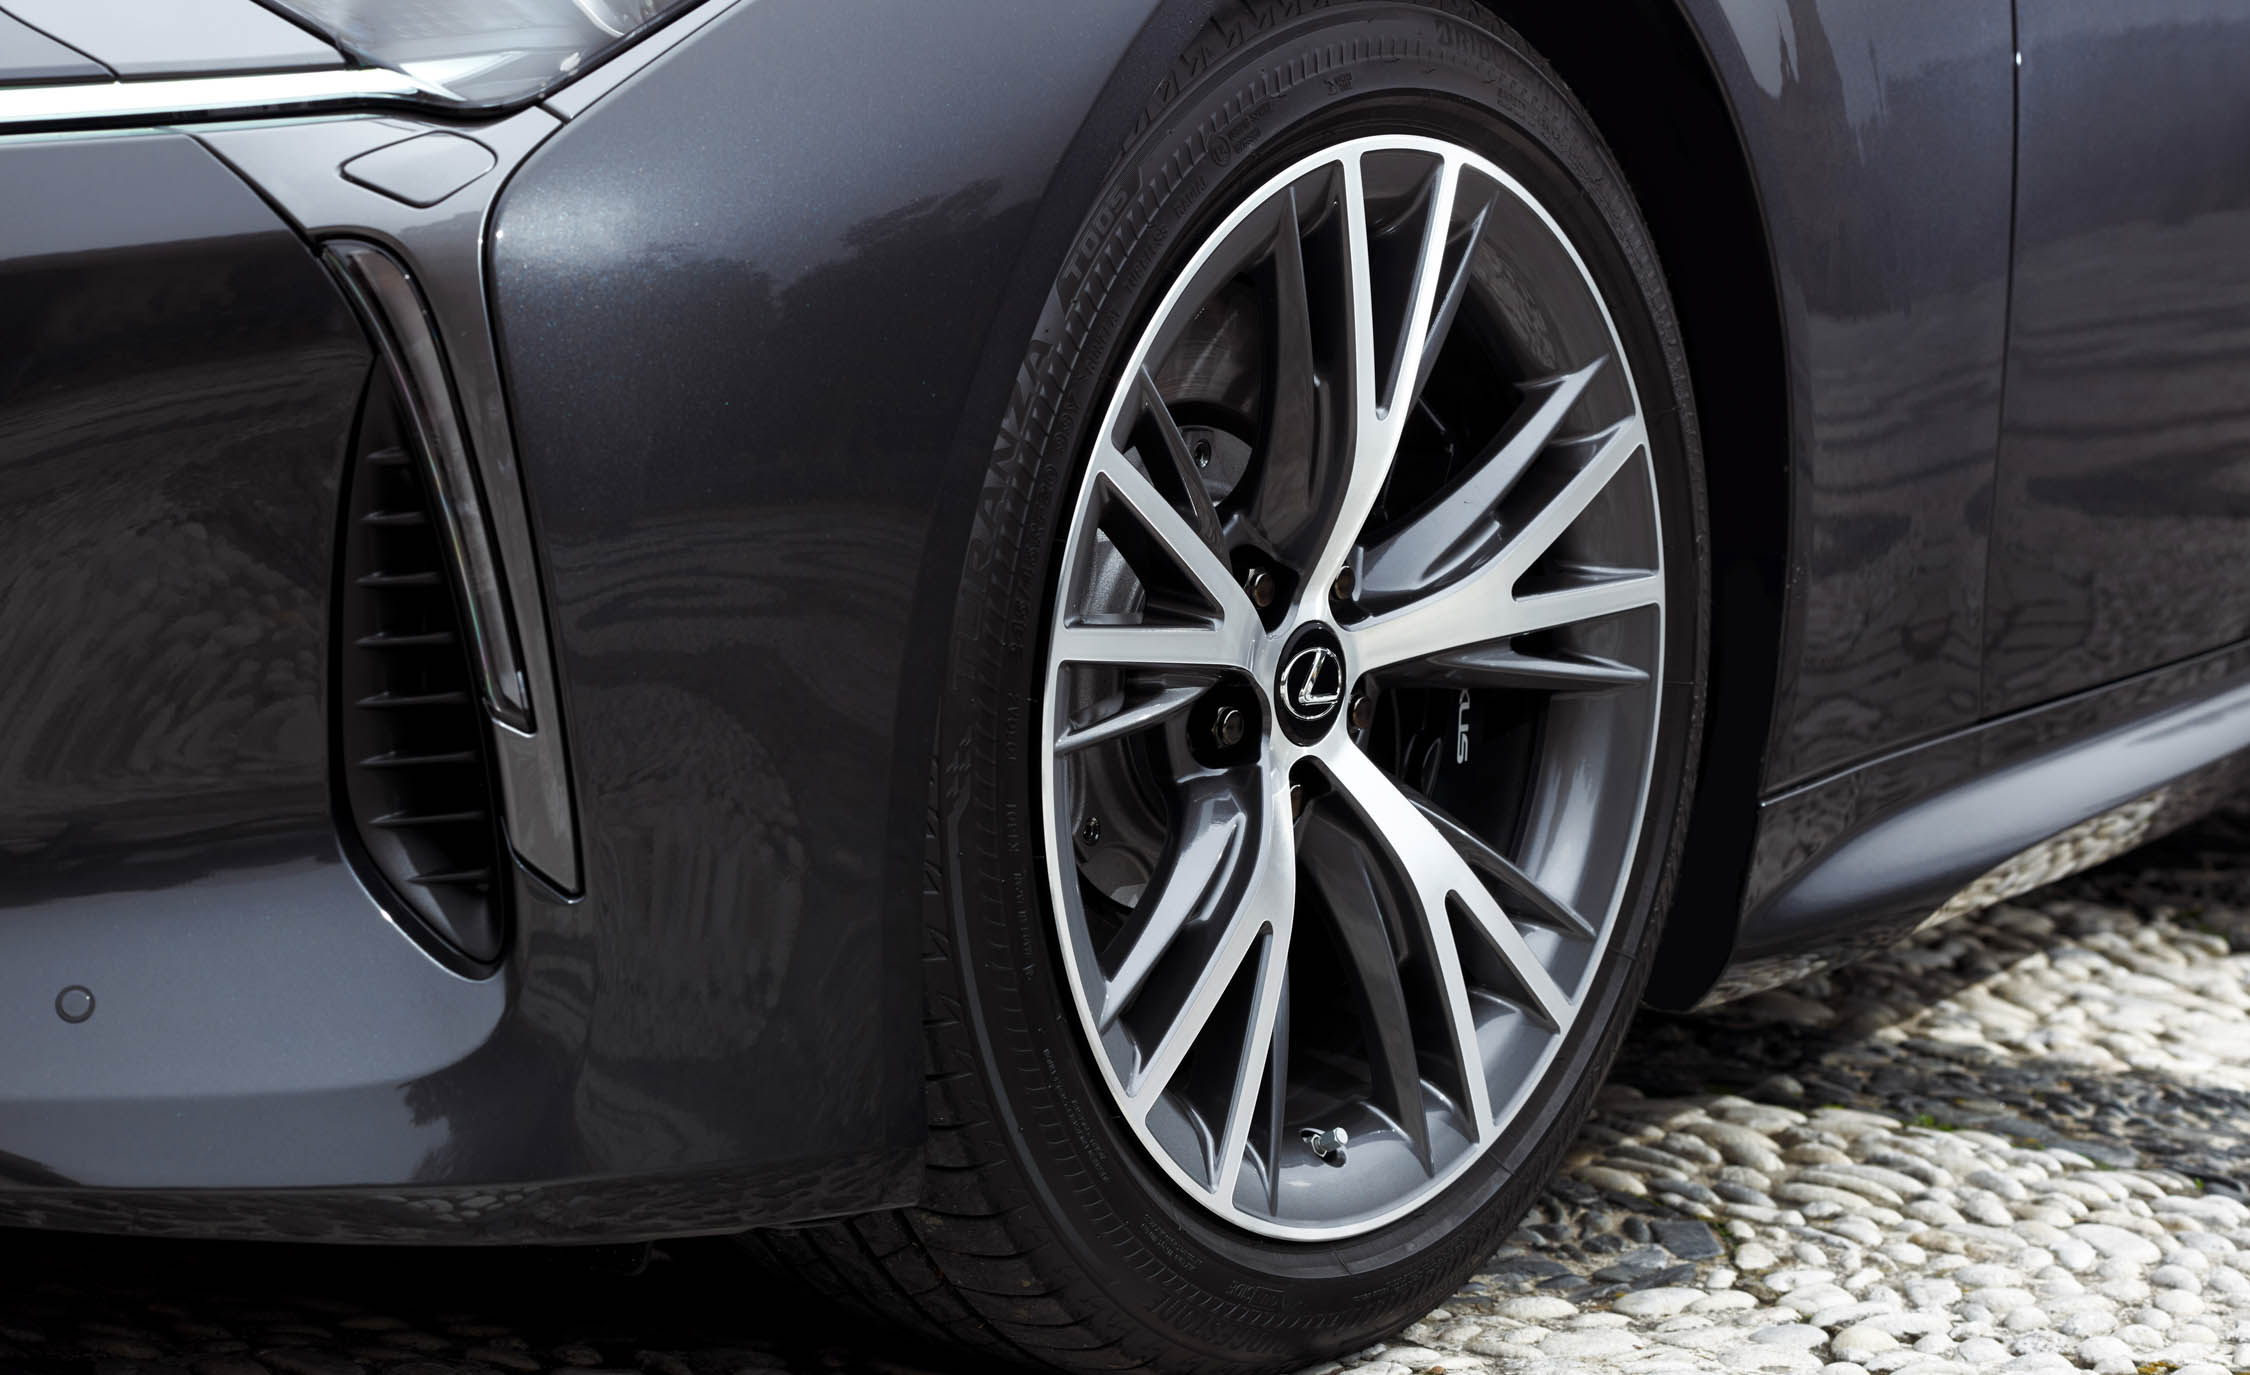 2018 Lexus Lc 500 Black Exterior View Wheel Trim (Photo 69 of 84)